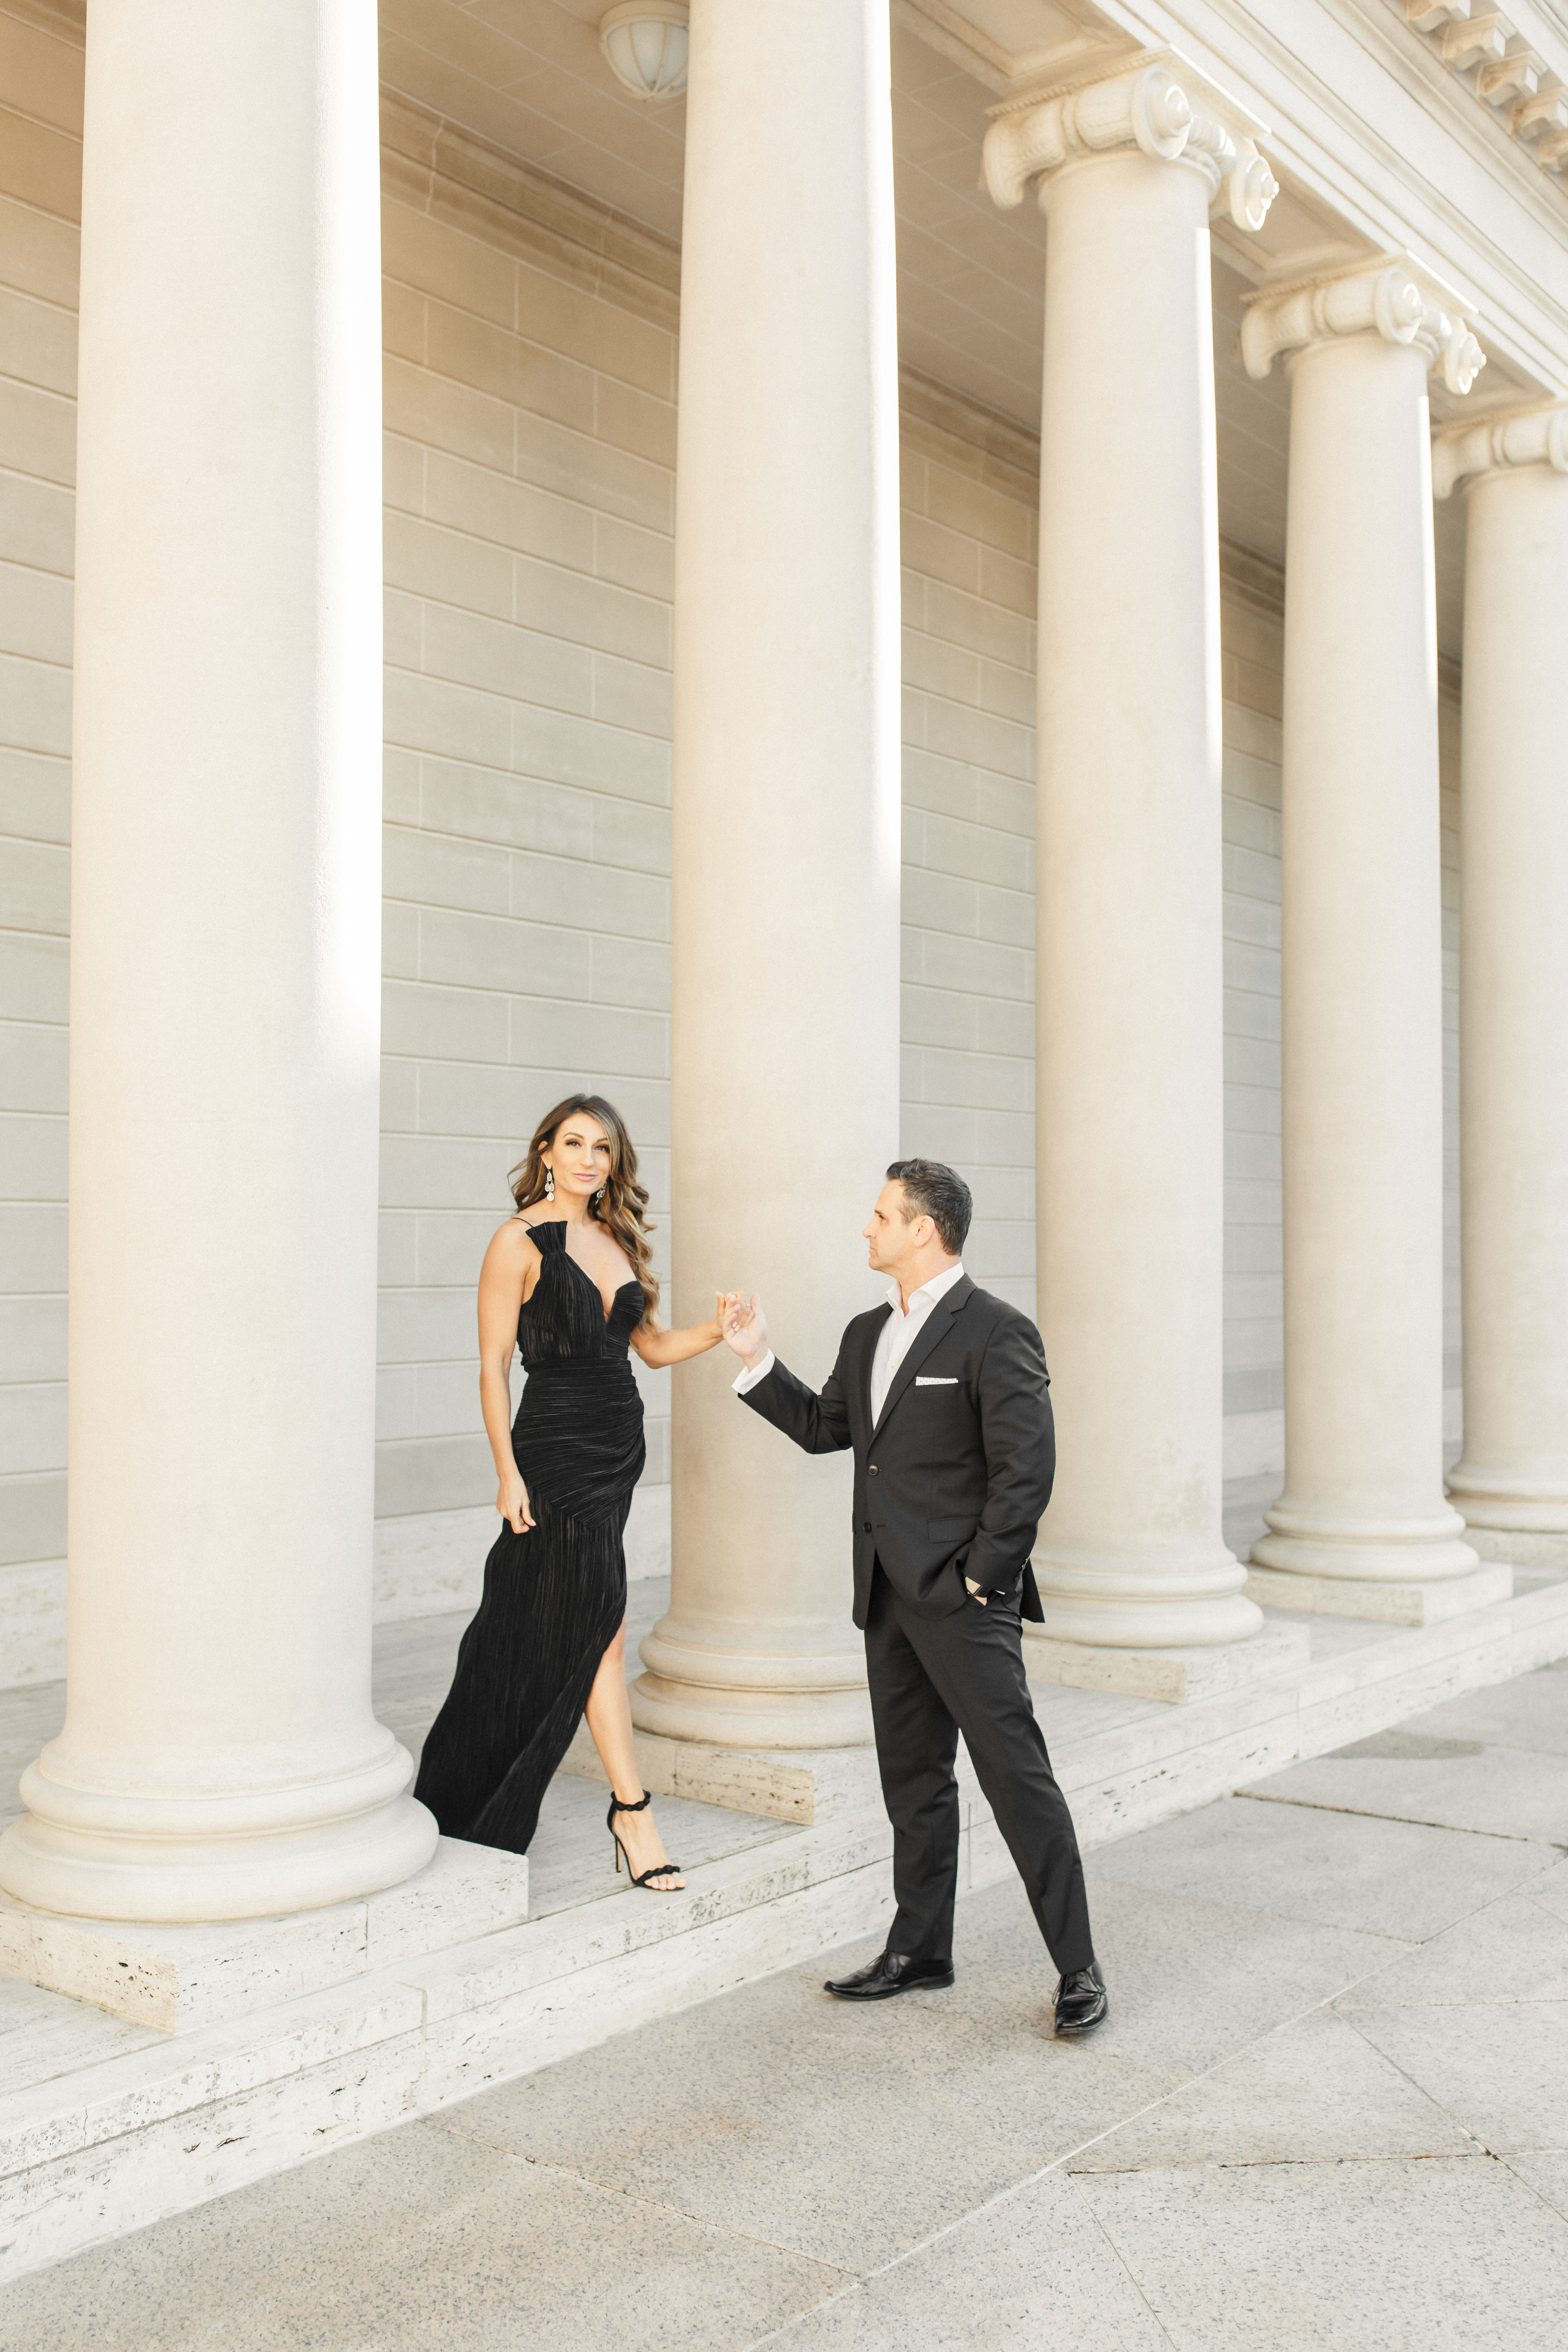 San Francisco Bay Area fine art wedding photographer